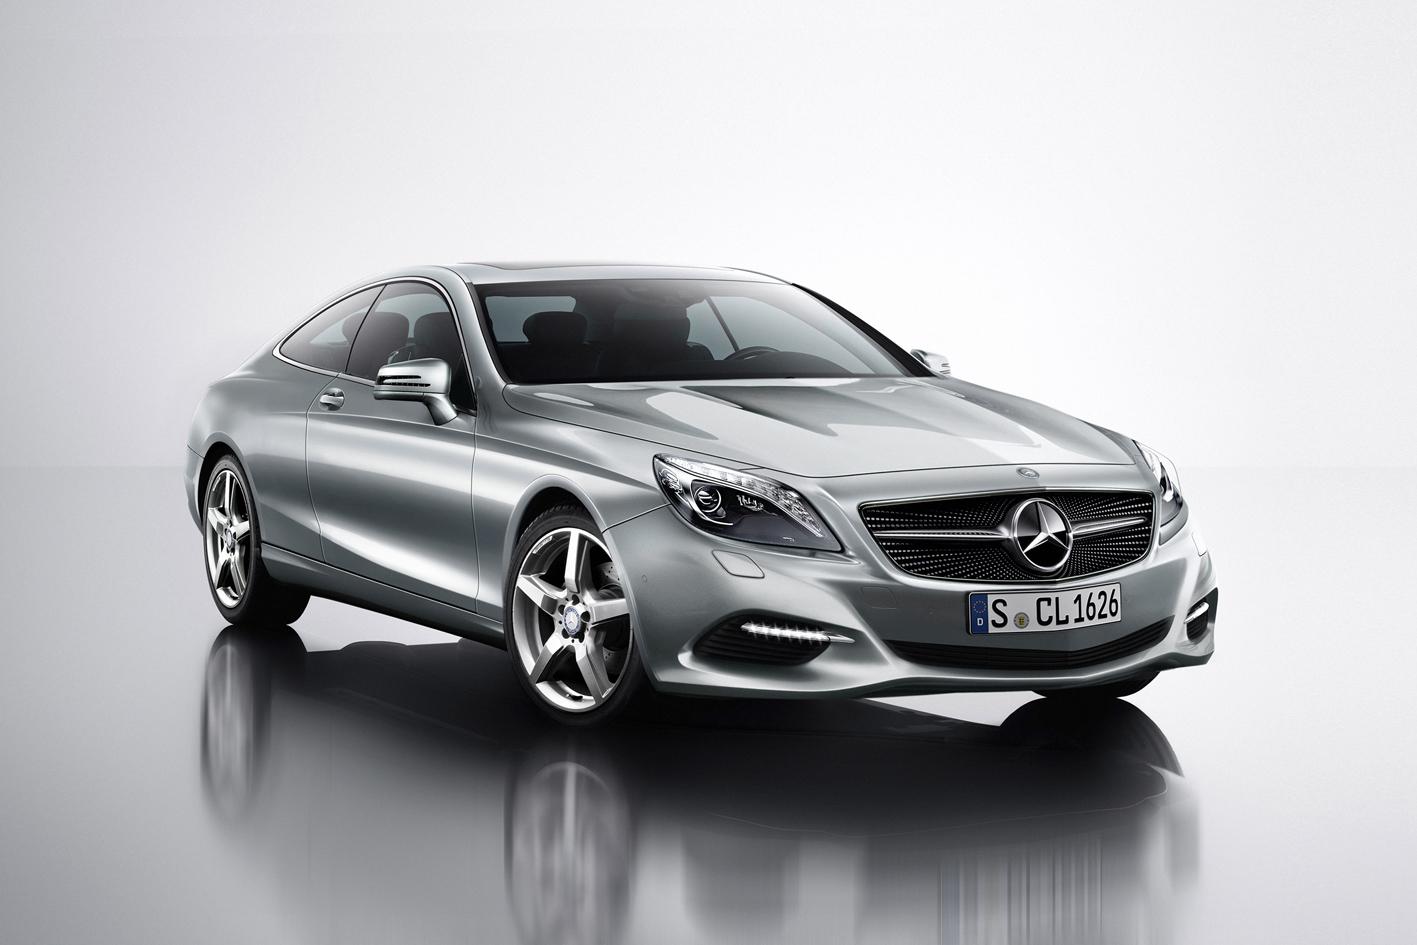 Danh sách những chiếc xe sẽ tham gia Detroit Auto Show 2014 5